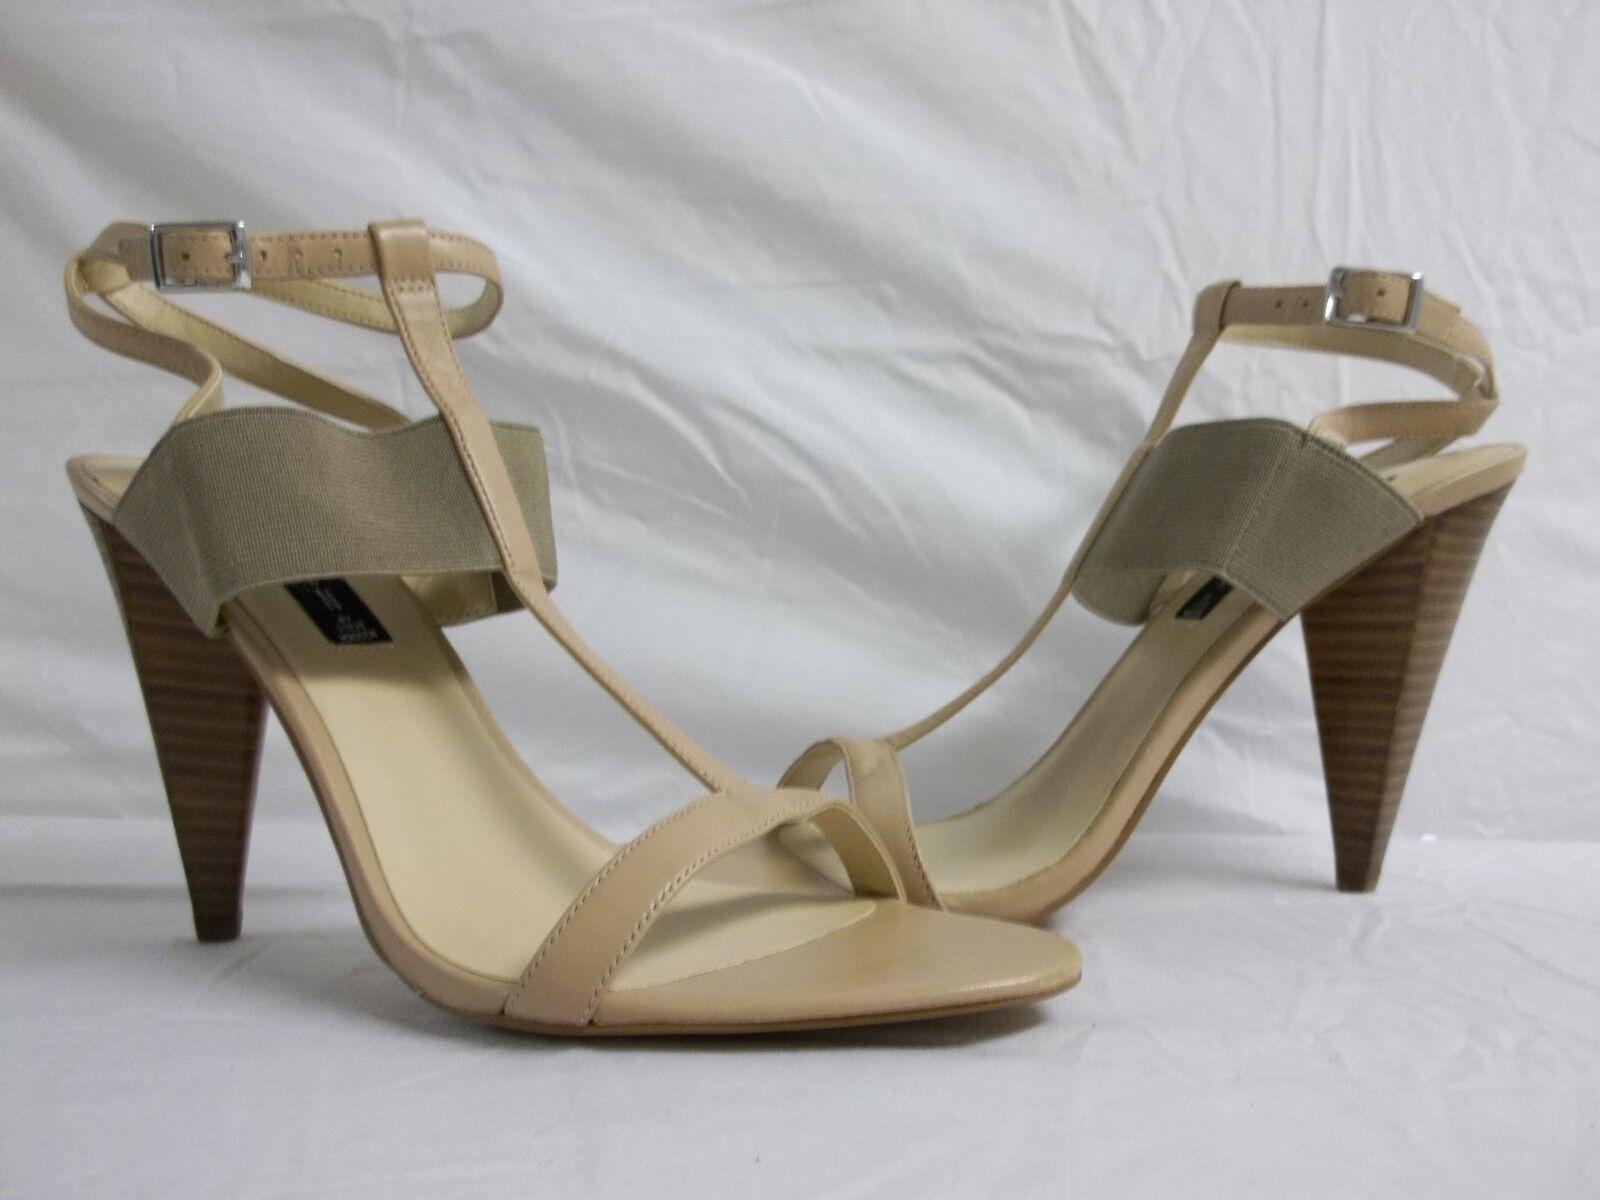 Steven By Steve Madden 9.5 M Lola Leather Open Toe Heels chaussures New femmes NWOB